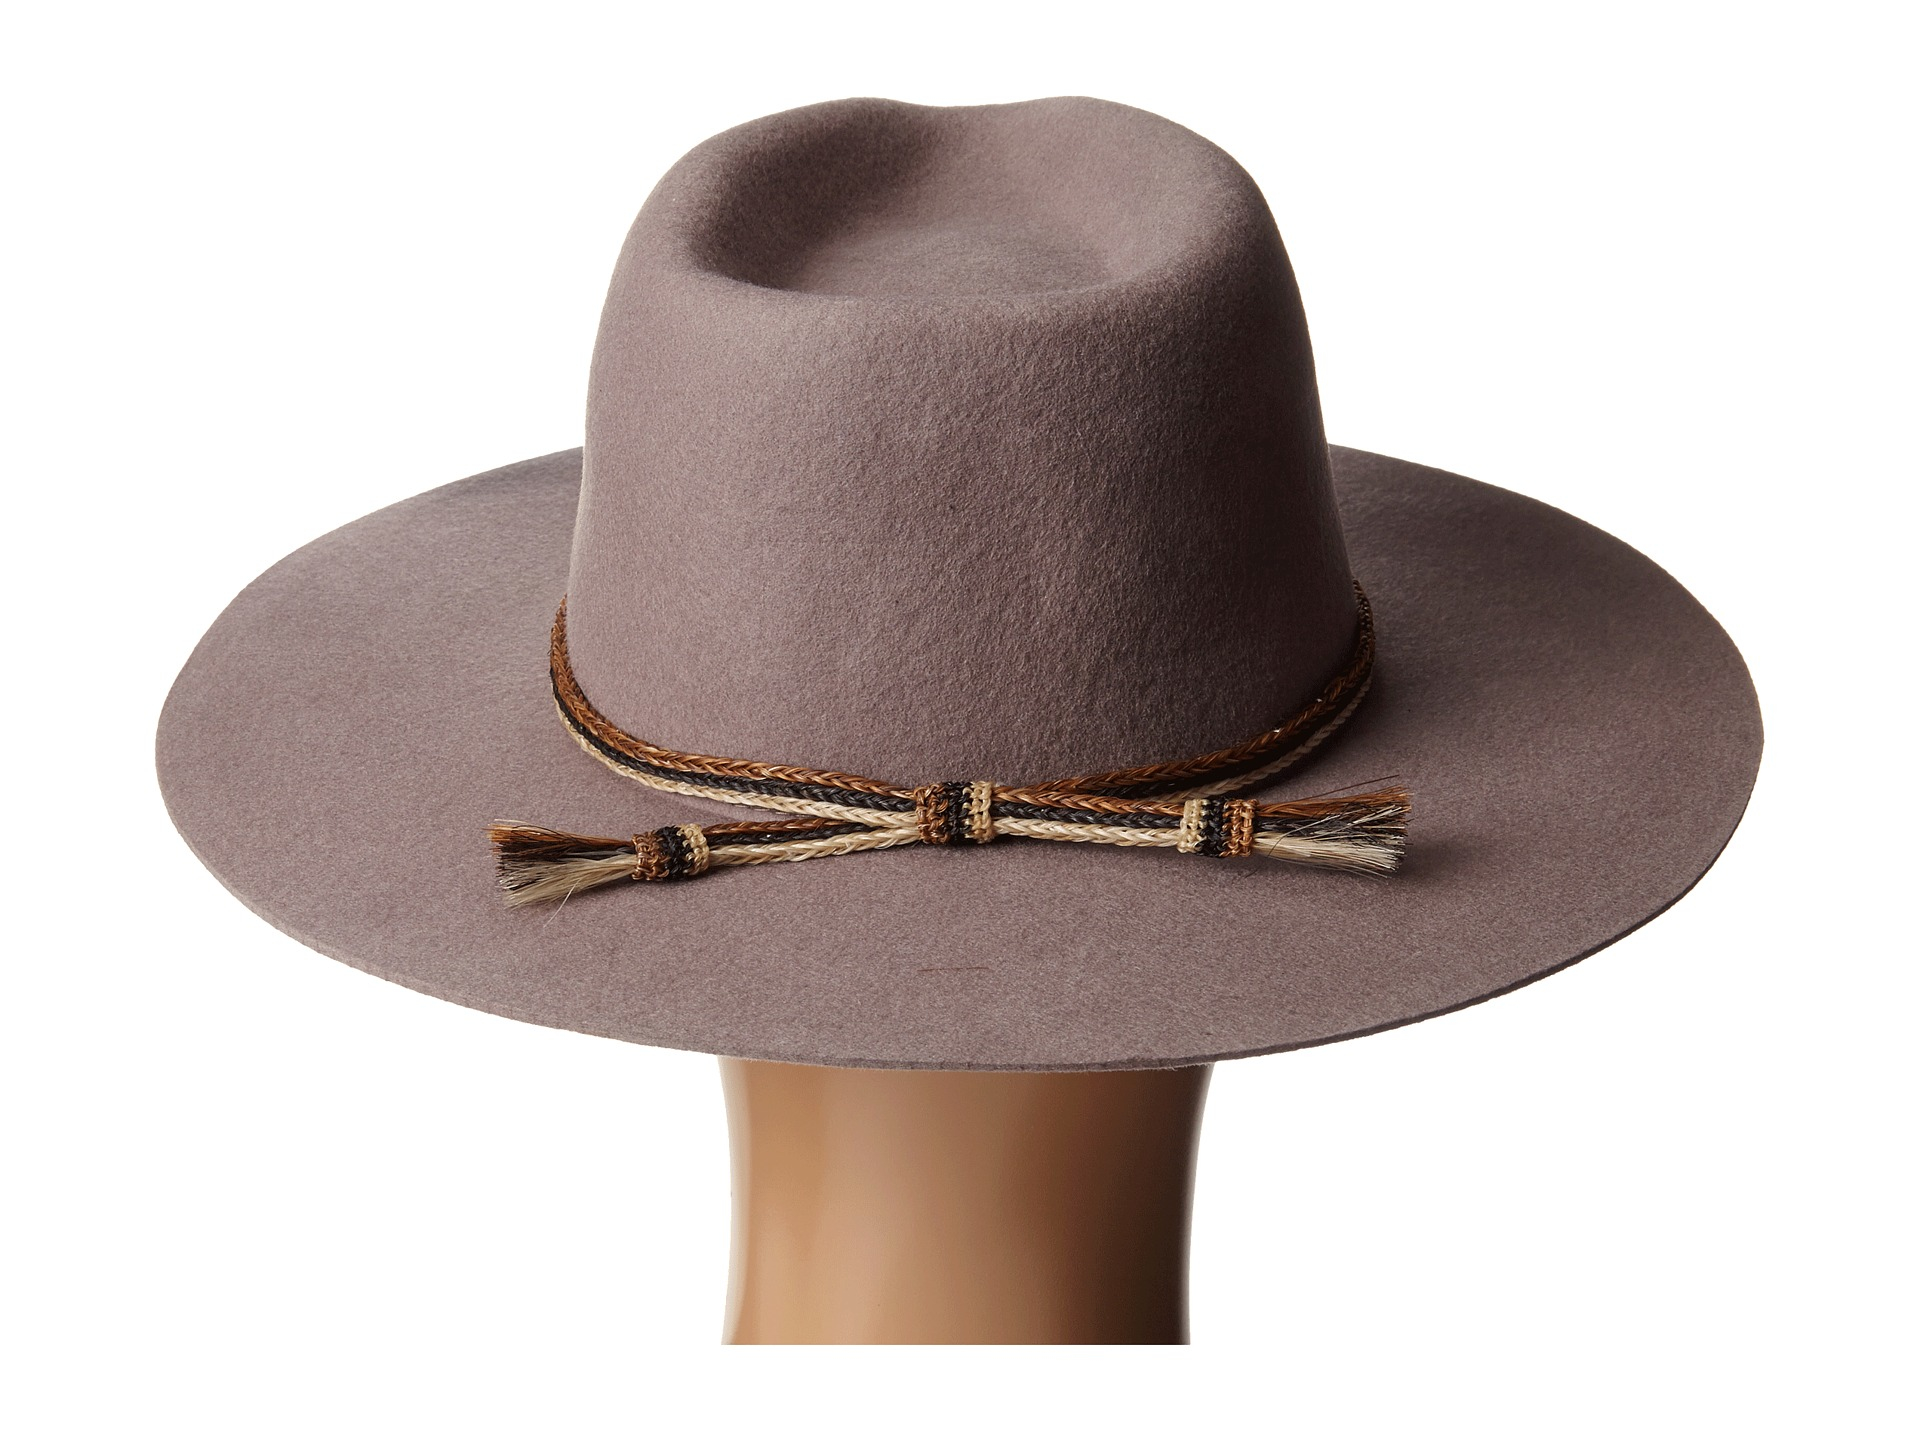 30f75a12fde23 ... get lyst brixton leonard hat in gray 9a79b f18e7